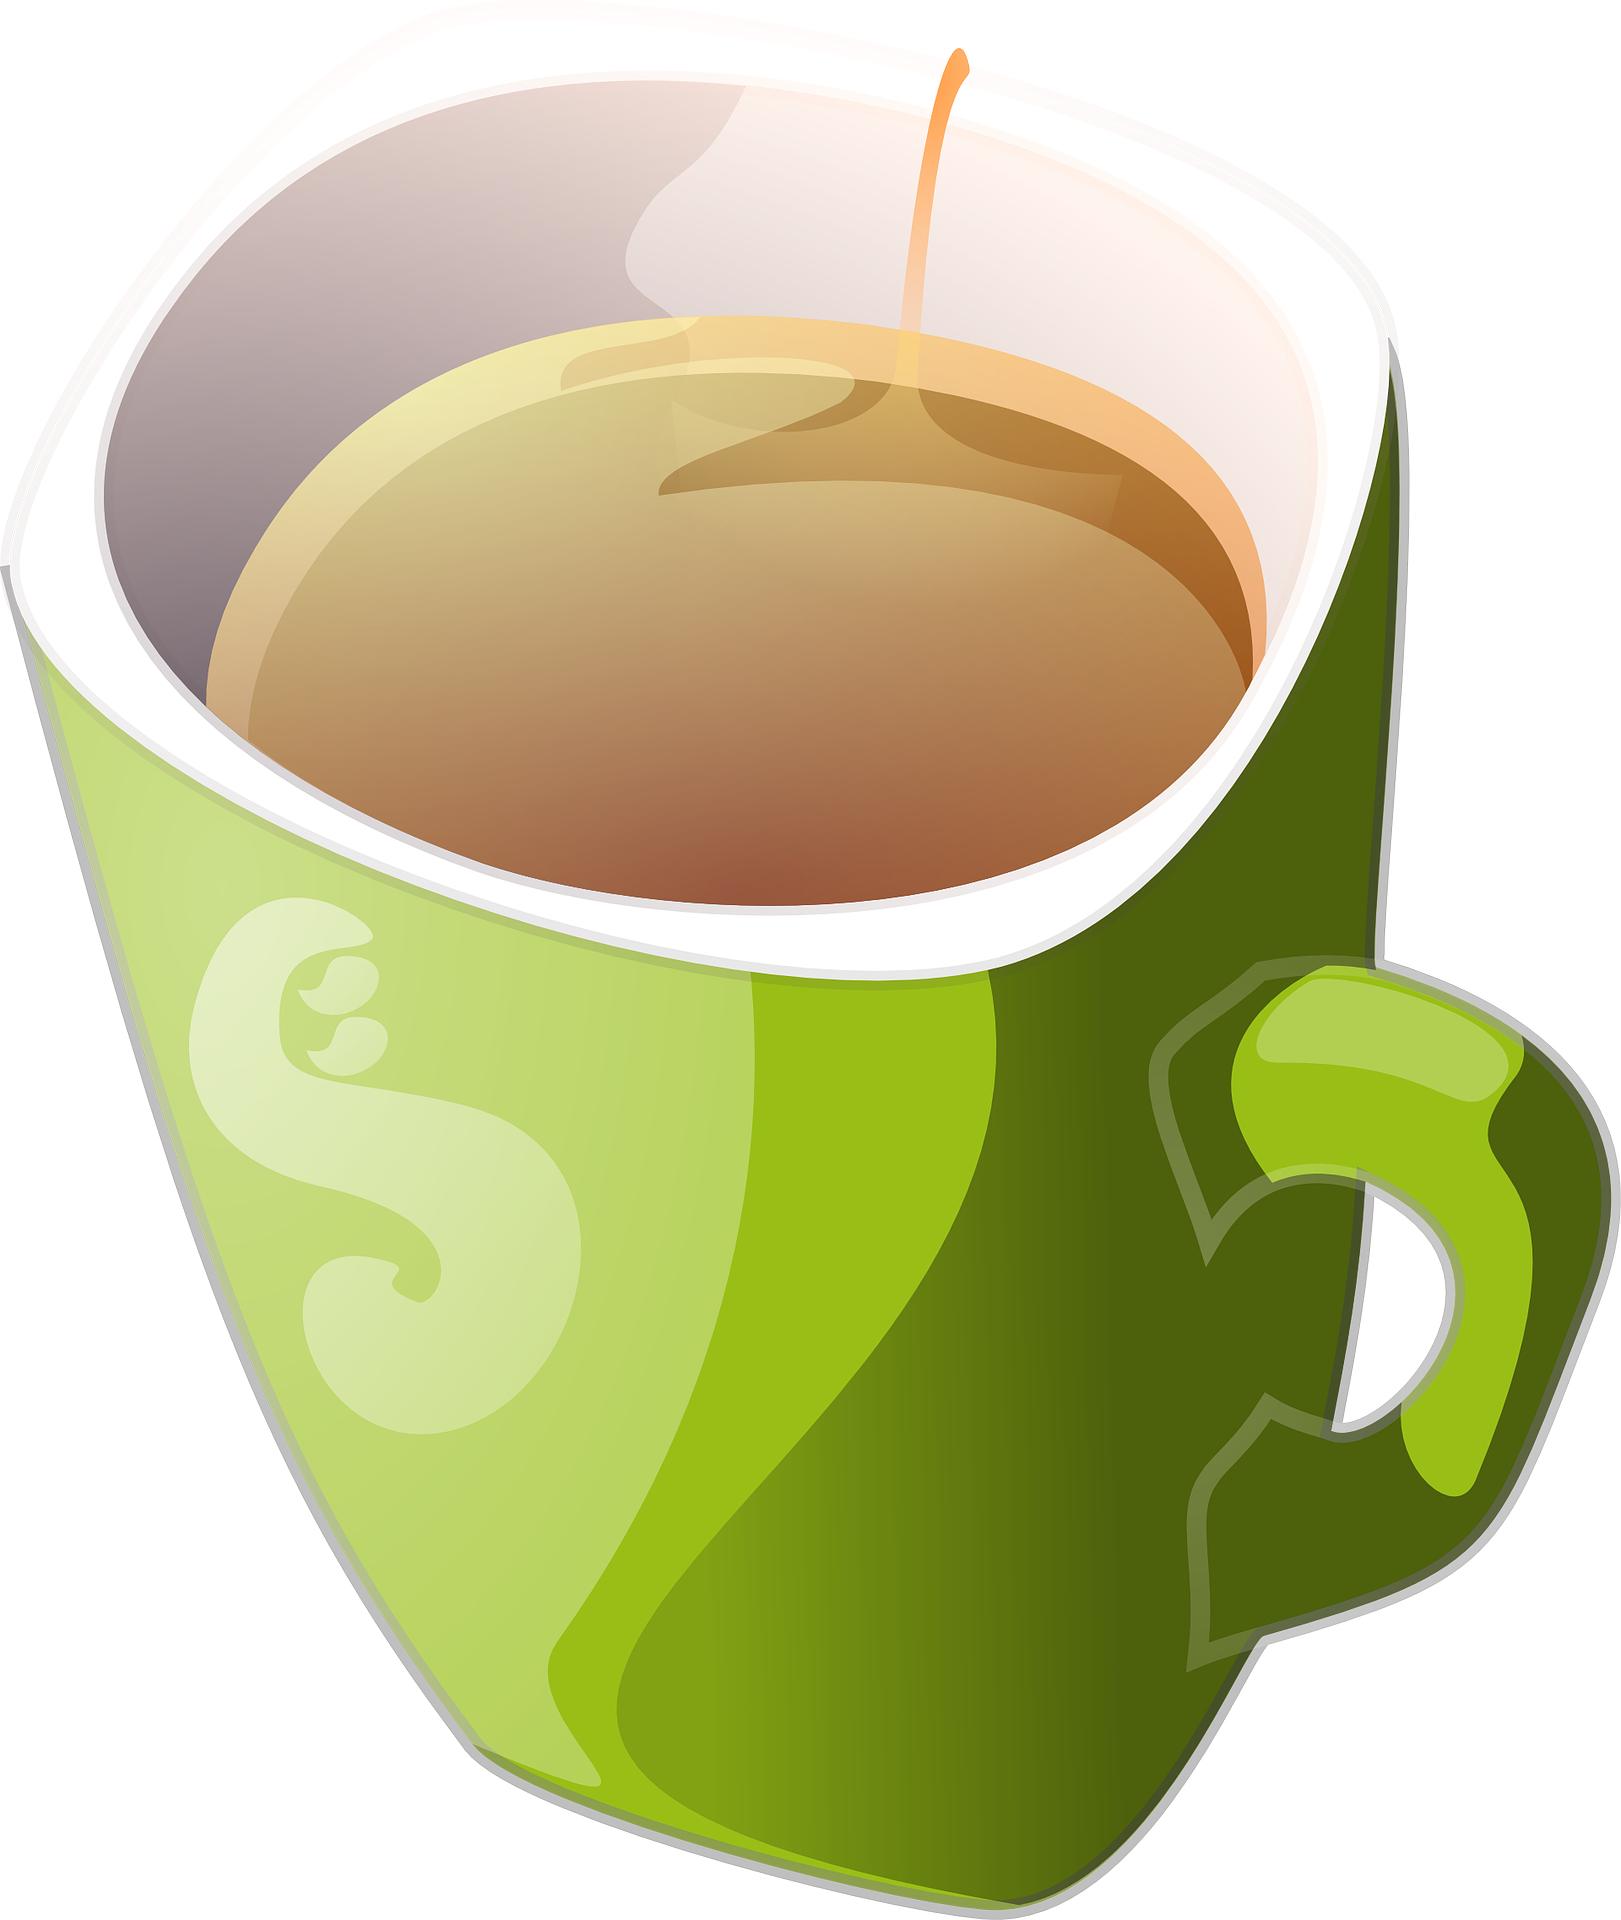 beverage-green mug,cup vector